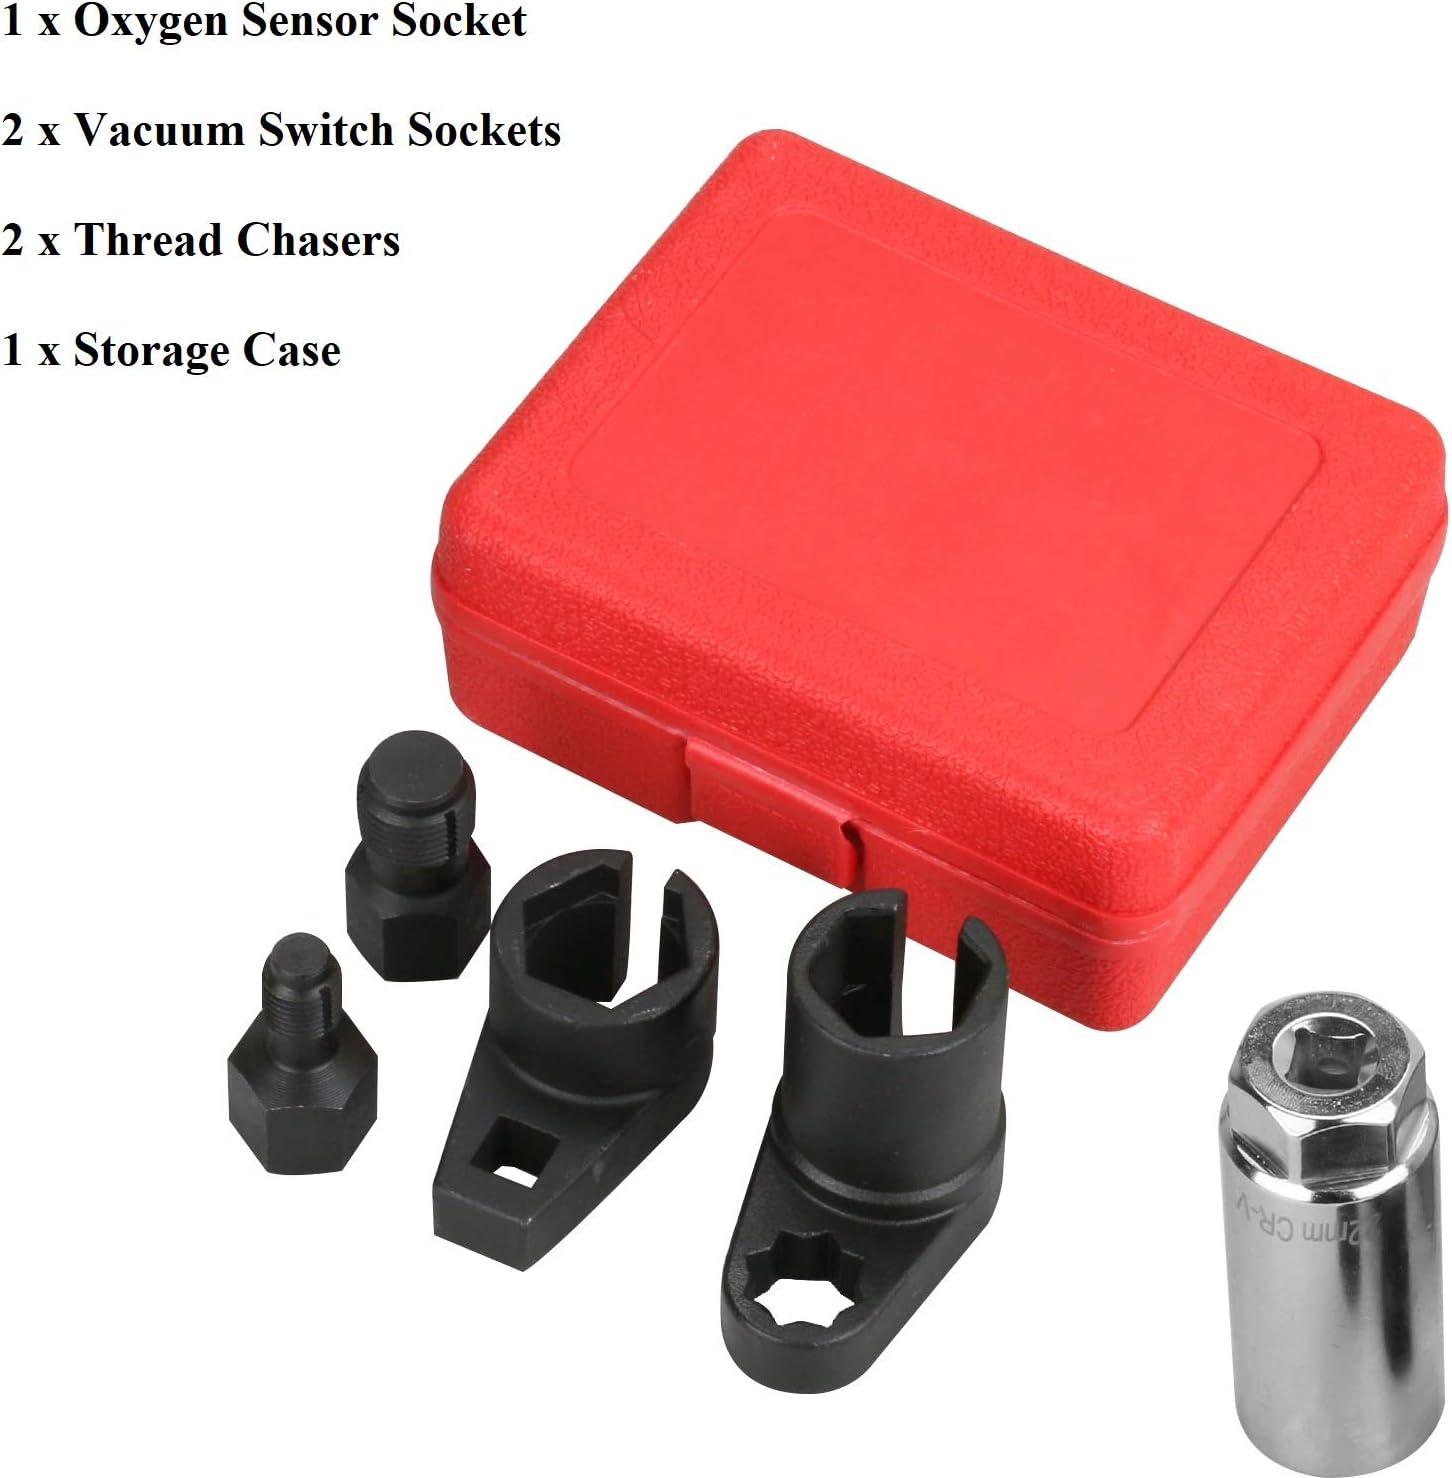 Thread Chaser Automotive Oxygen Sensor Socket Wrench Removal Tool Oxygen Sensor Socket,Offset Wrench Remover Tool A7841F-FBA Thread Chaser Set 5 Pcs by Lucky Seven